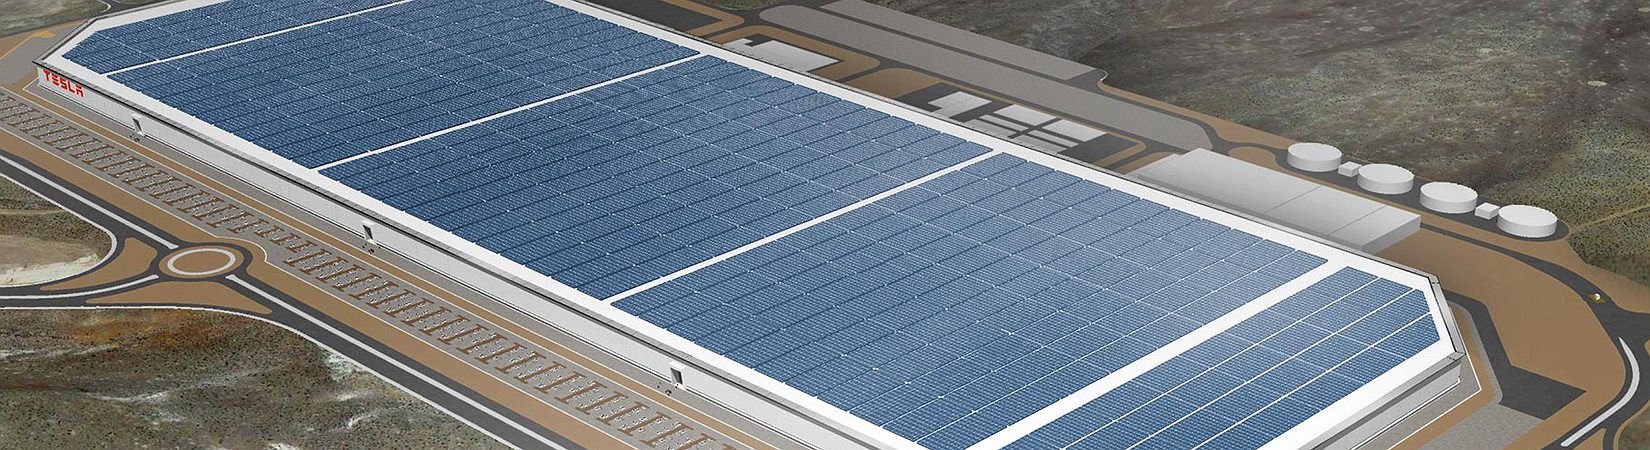 Finland's Vaasa wants to host Tesla's next Gigafactory